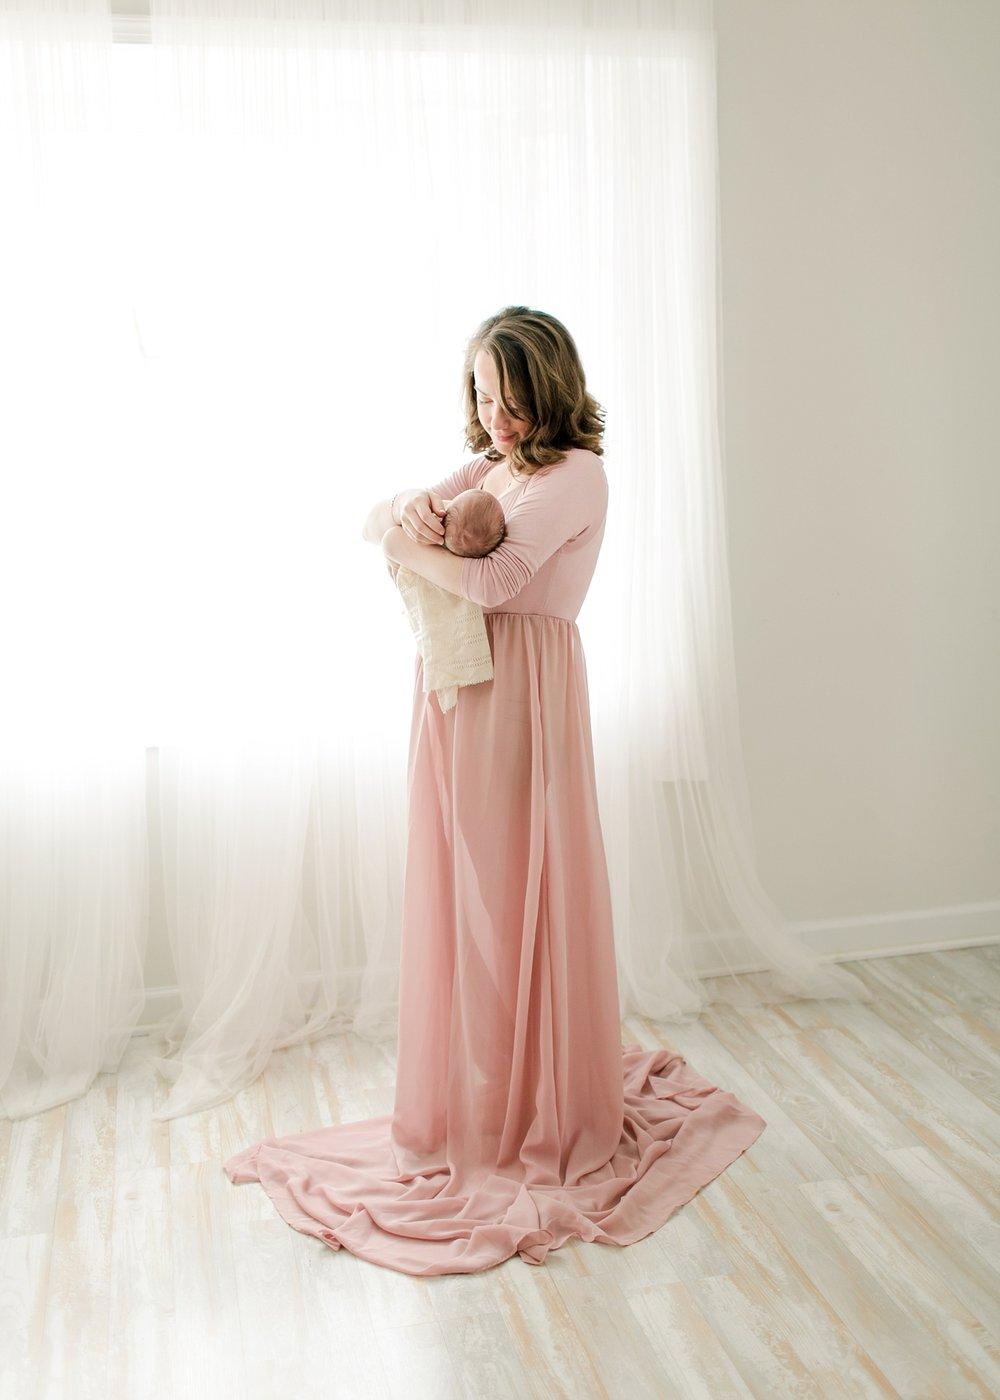 lynchburg-virginia-studio-newborn-photos-_0012.jpg